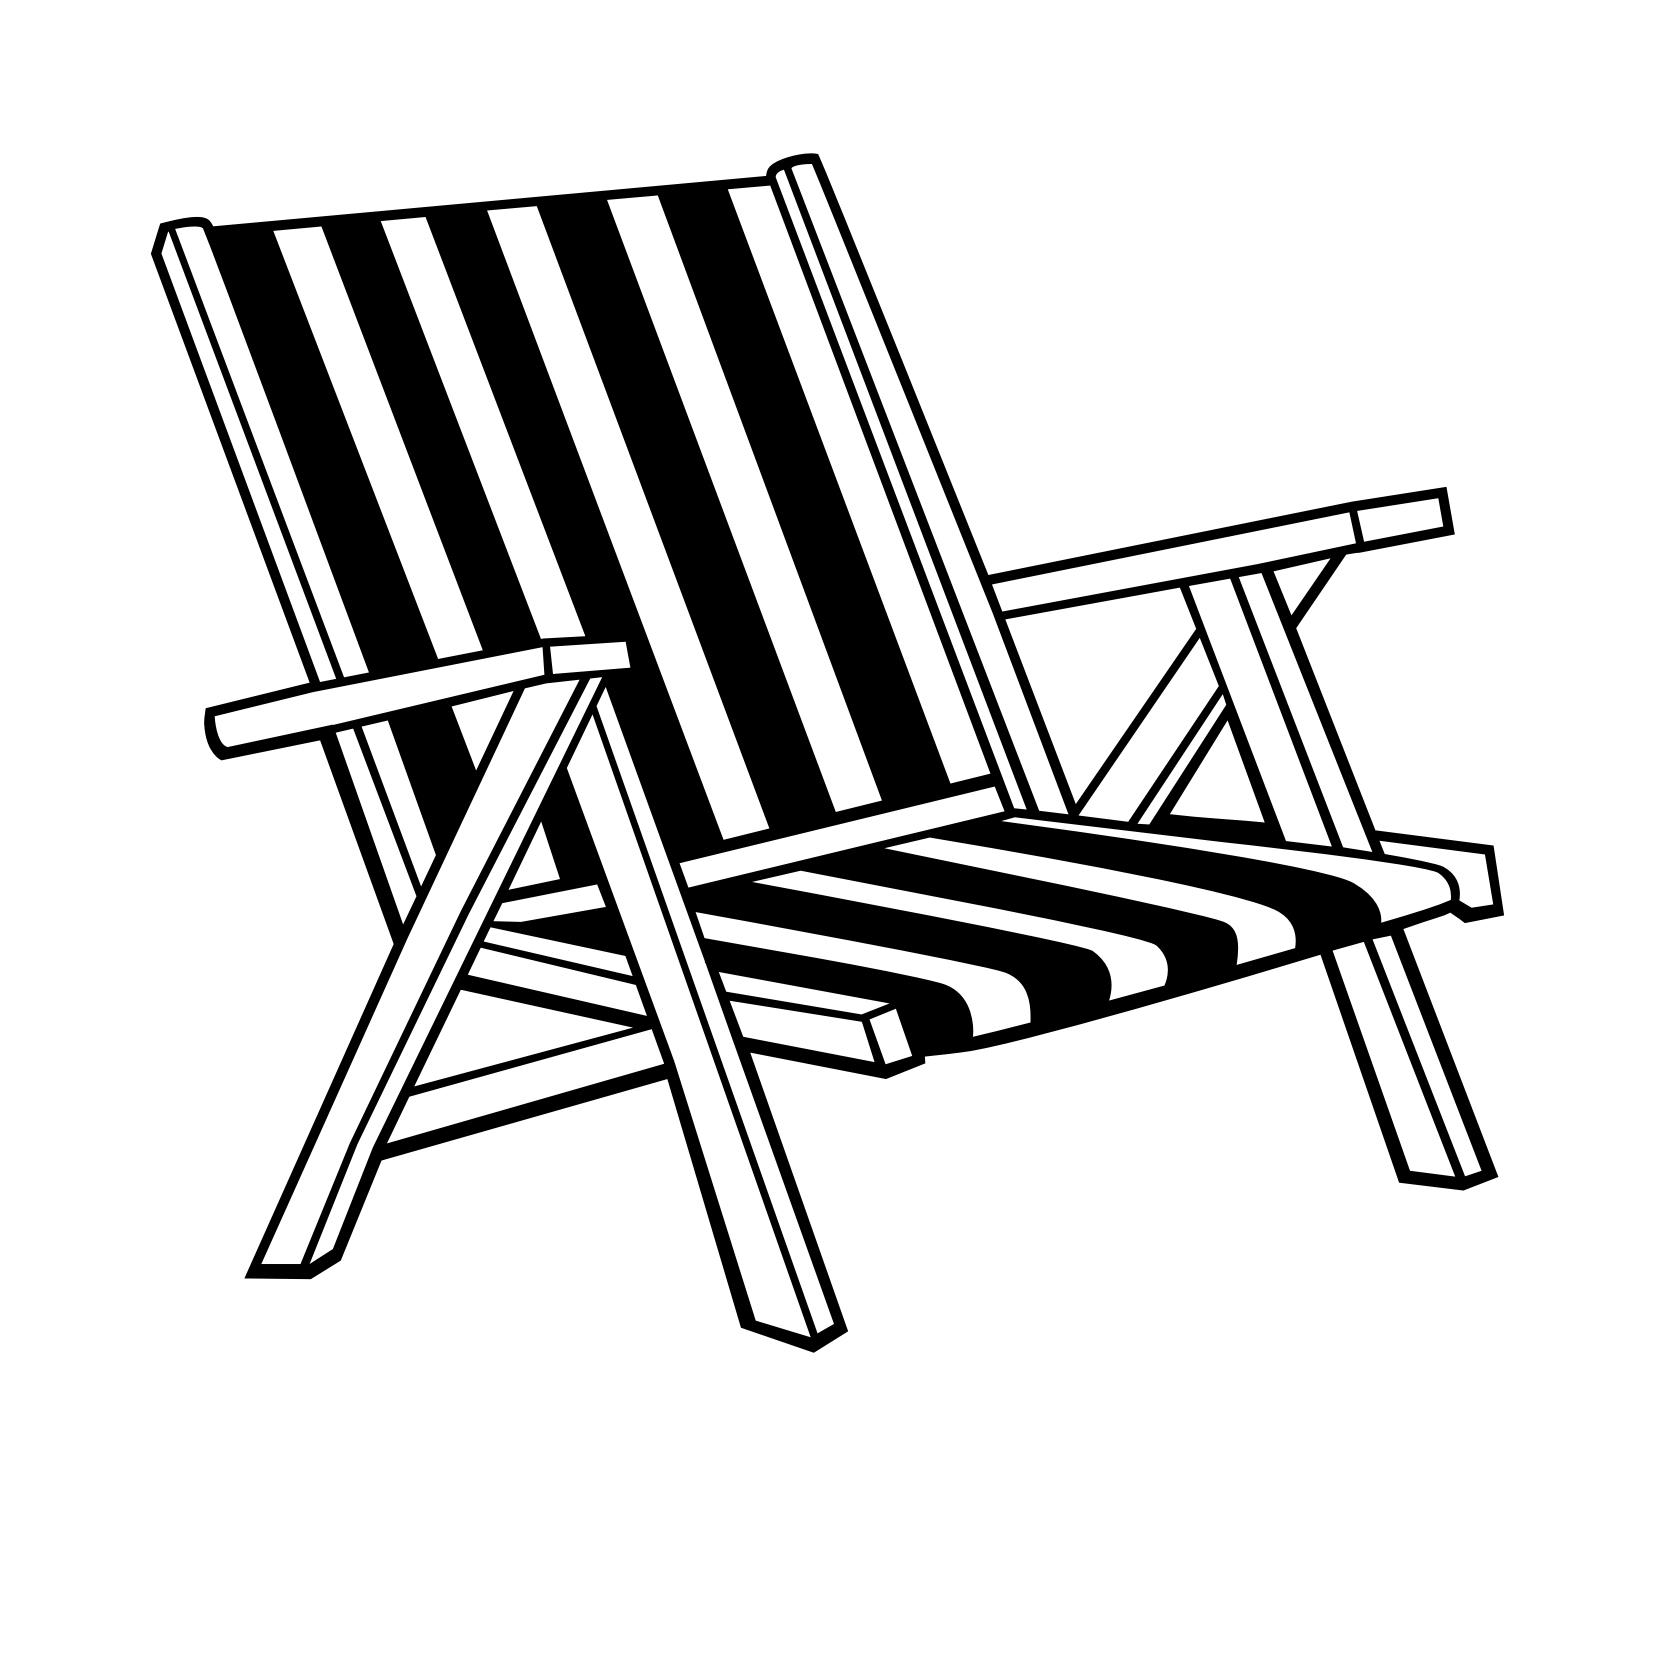 1654x1654 Beach Chair Drawing Stunning Beach Chair Drawing 32 On Adirondack